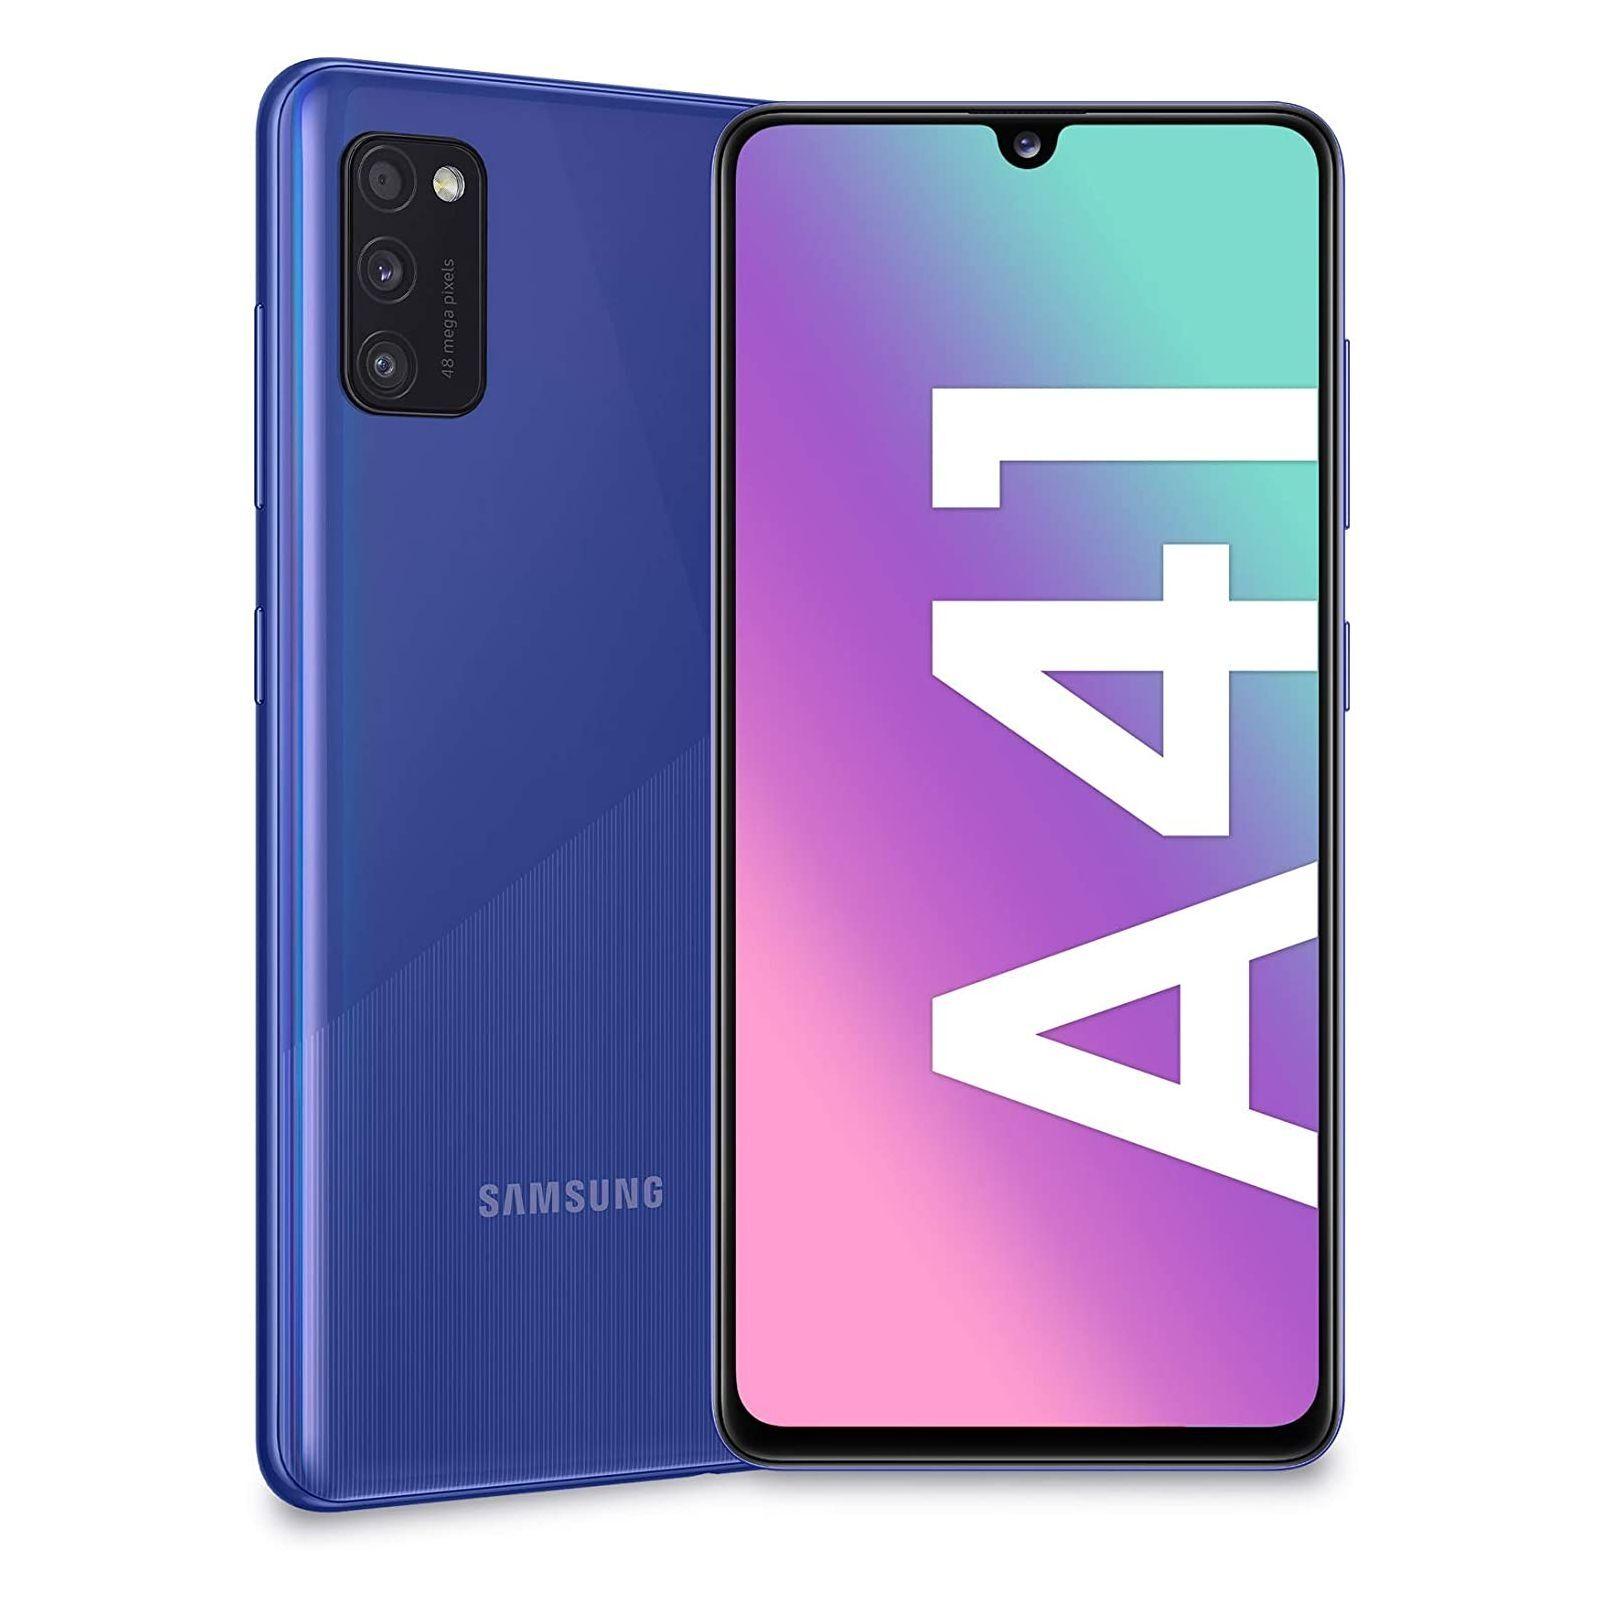 "samsung smartphone samsung galaxy a41 sm a415f dual sim 64 gb octa core 6.1"" super amoled 48 + 8 + 5 mp 4g lte wifi bluetooth refurbished prism crush blue"